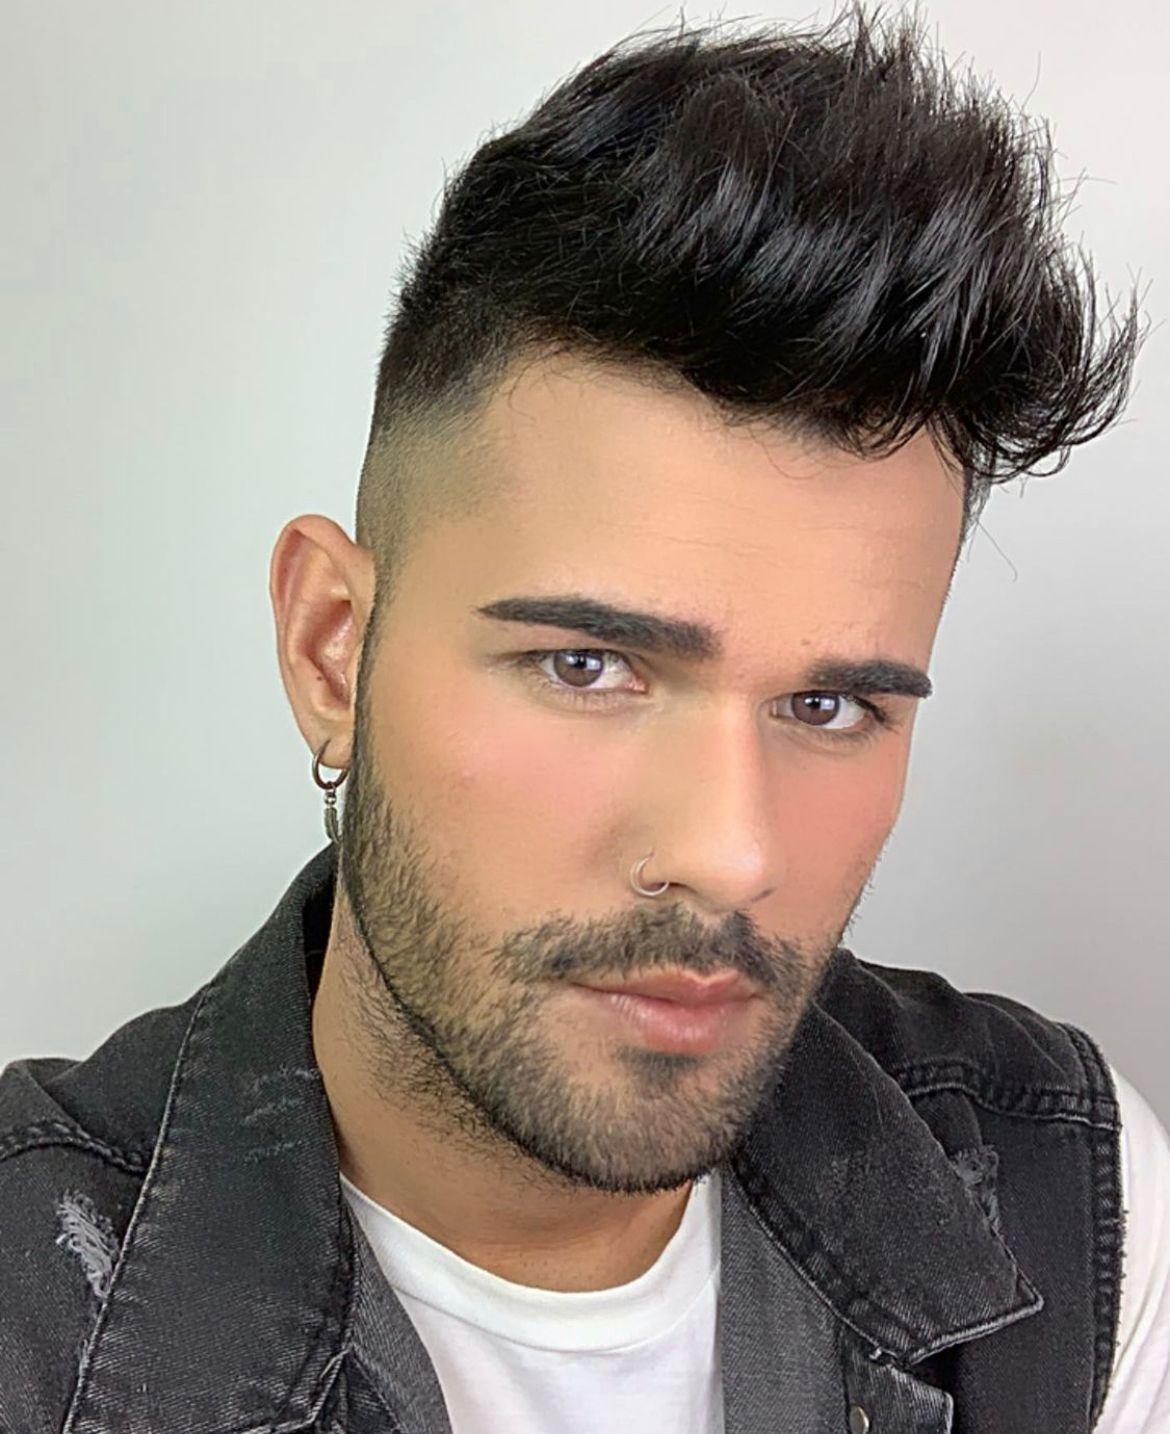 Enrique Bernabeu